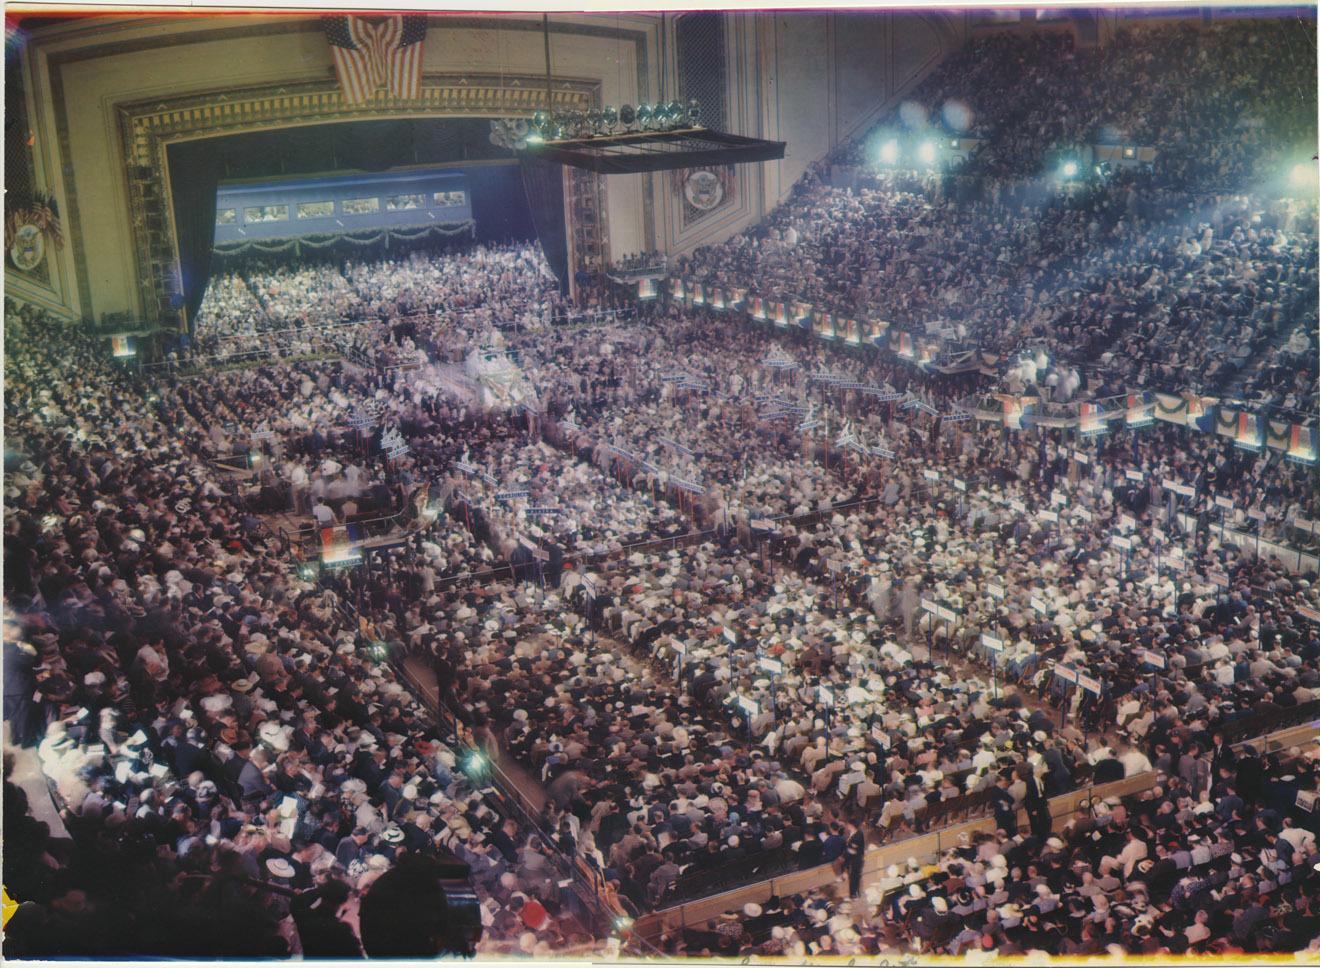 1940 Republican Convention by Harry Warnecke